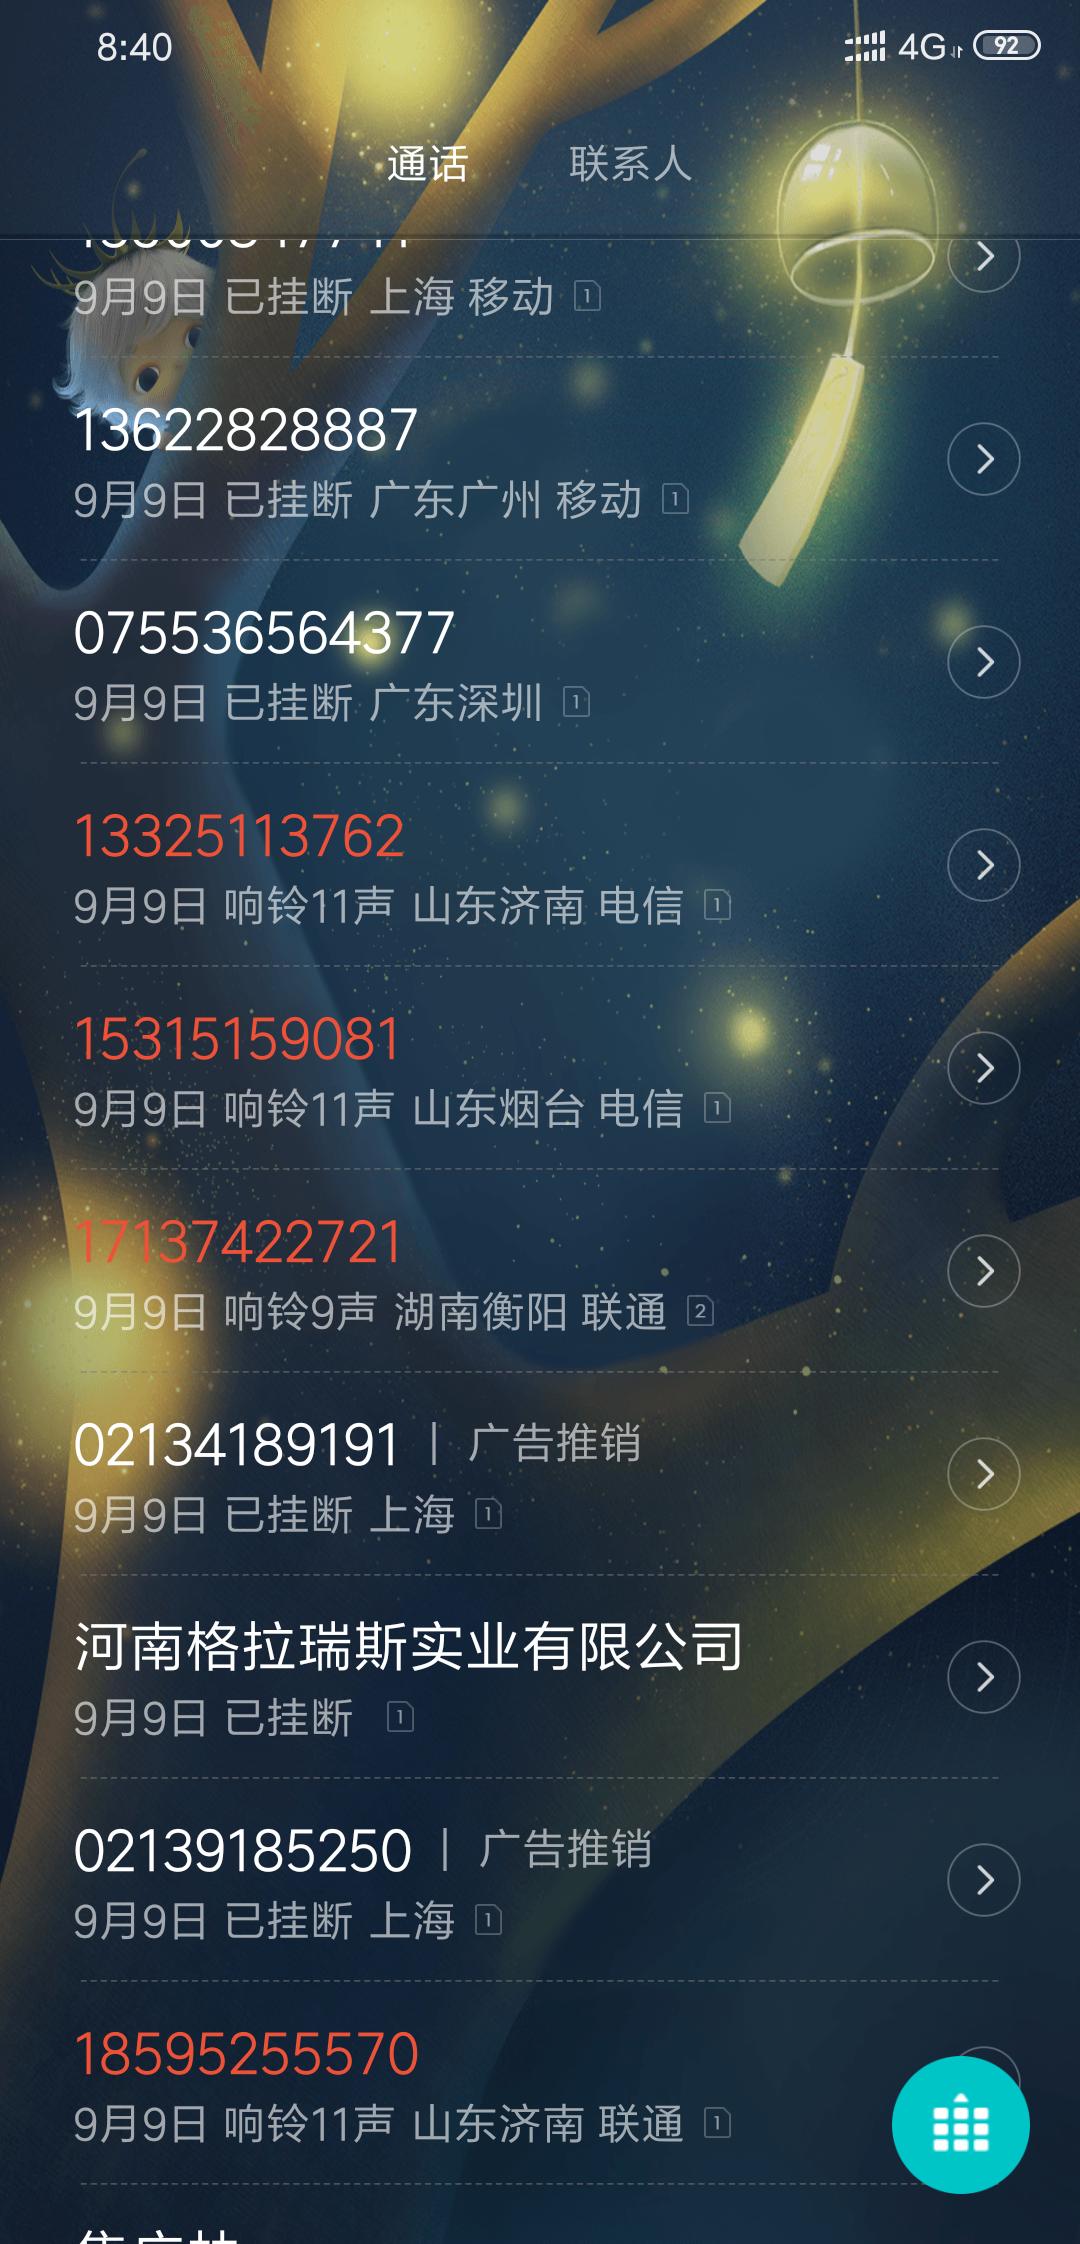 Screenshot_2019-09-10-08-40-13-925_com.android.contacts.png